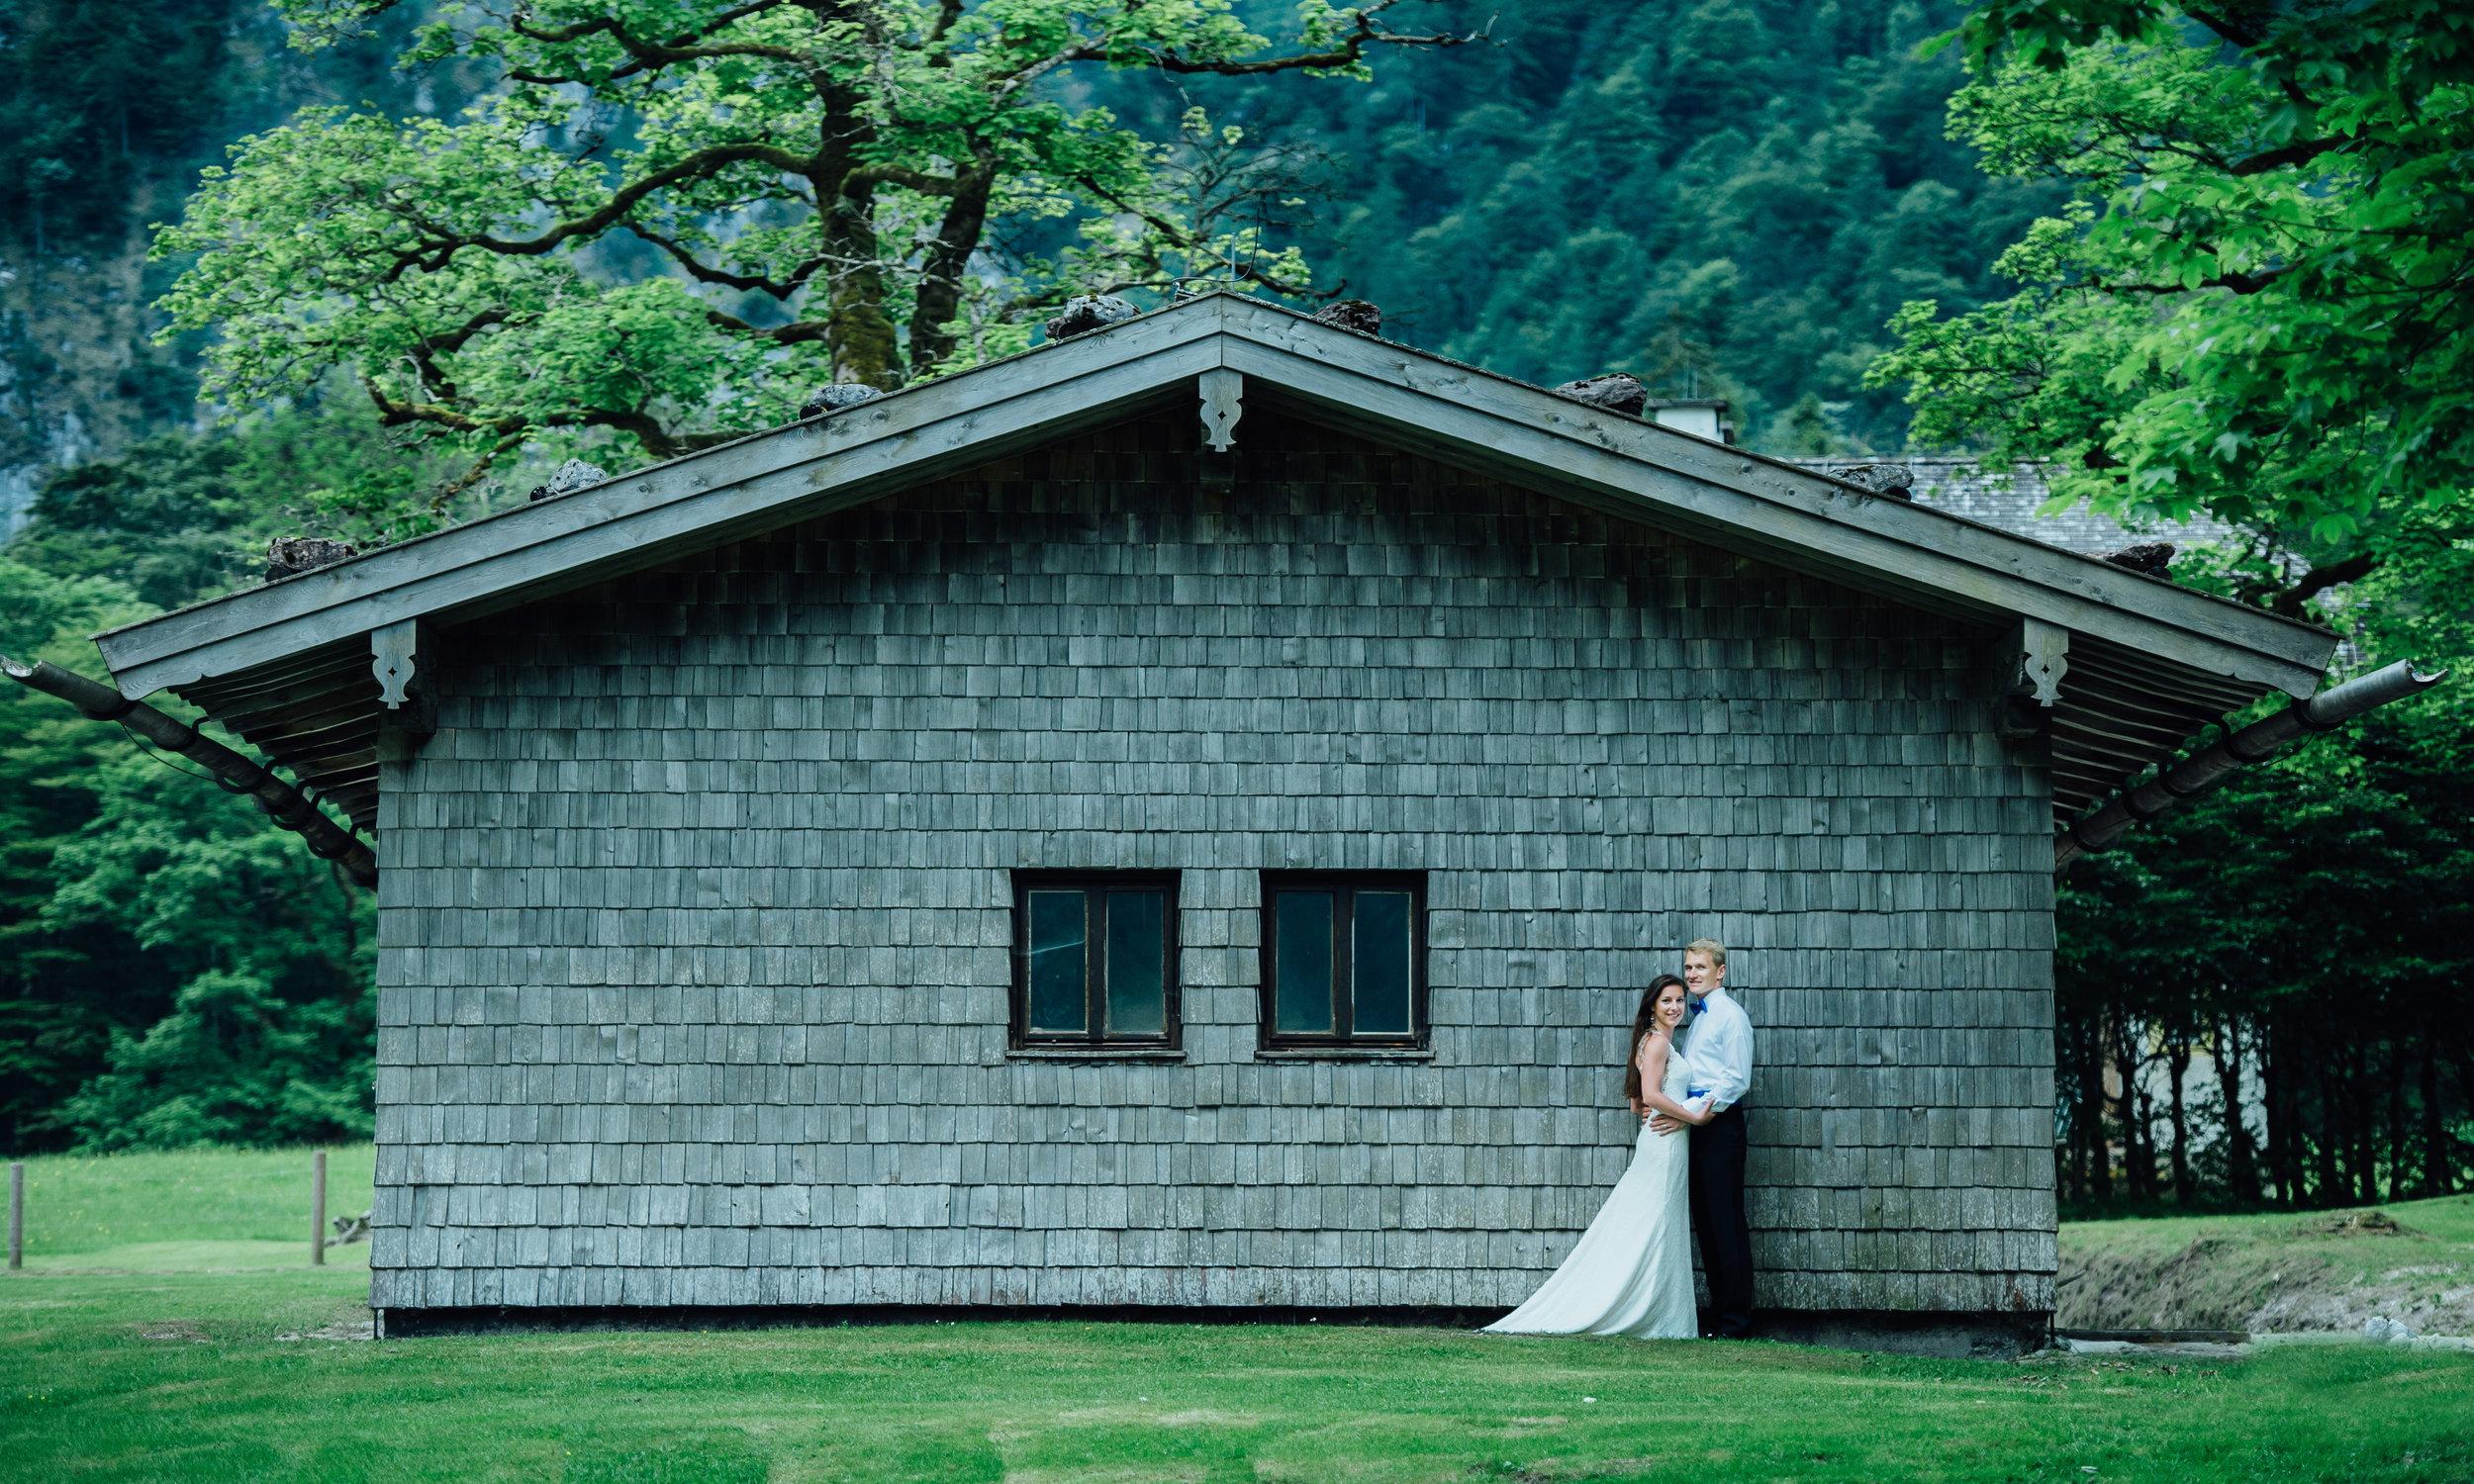 Hochzeitfotos-Brautpaar.jpg